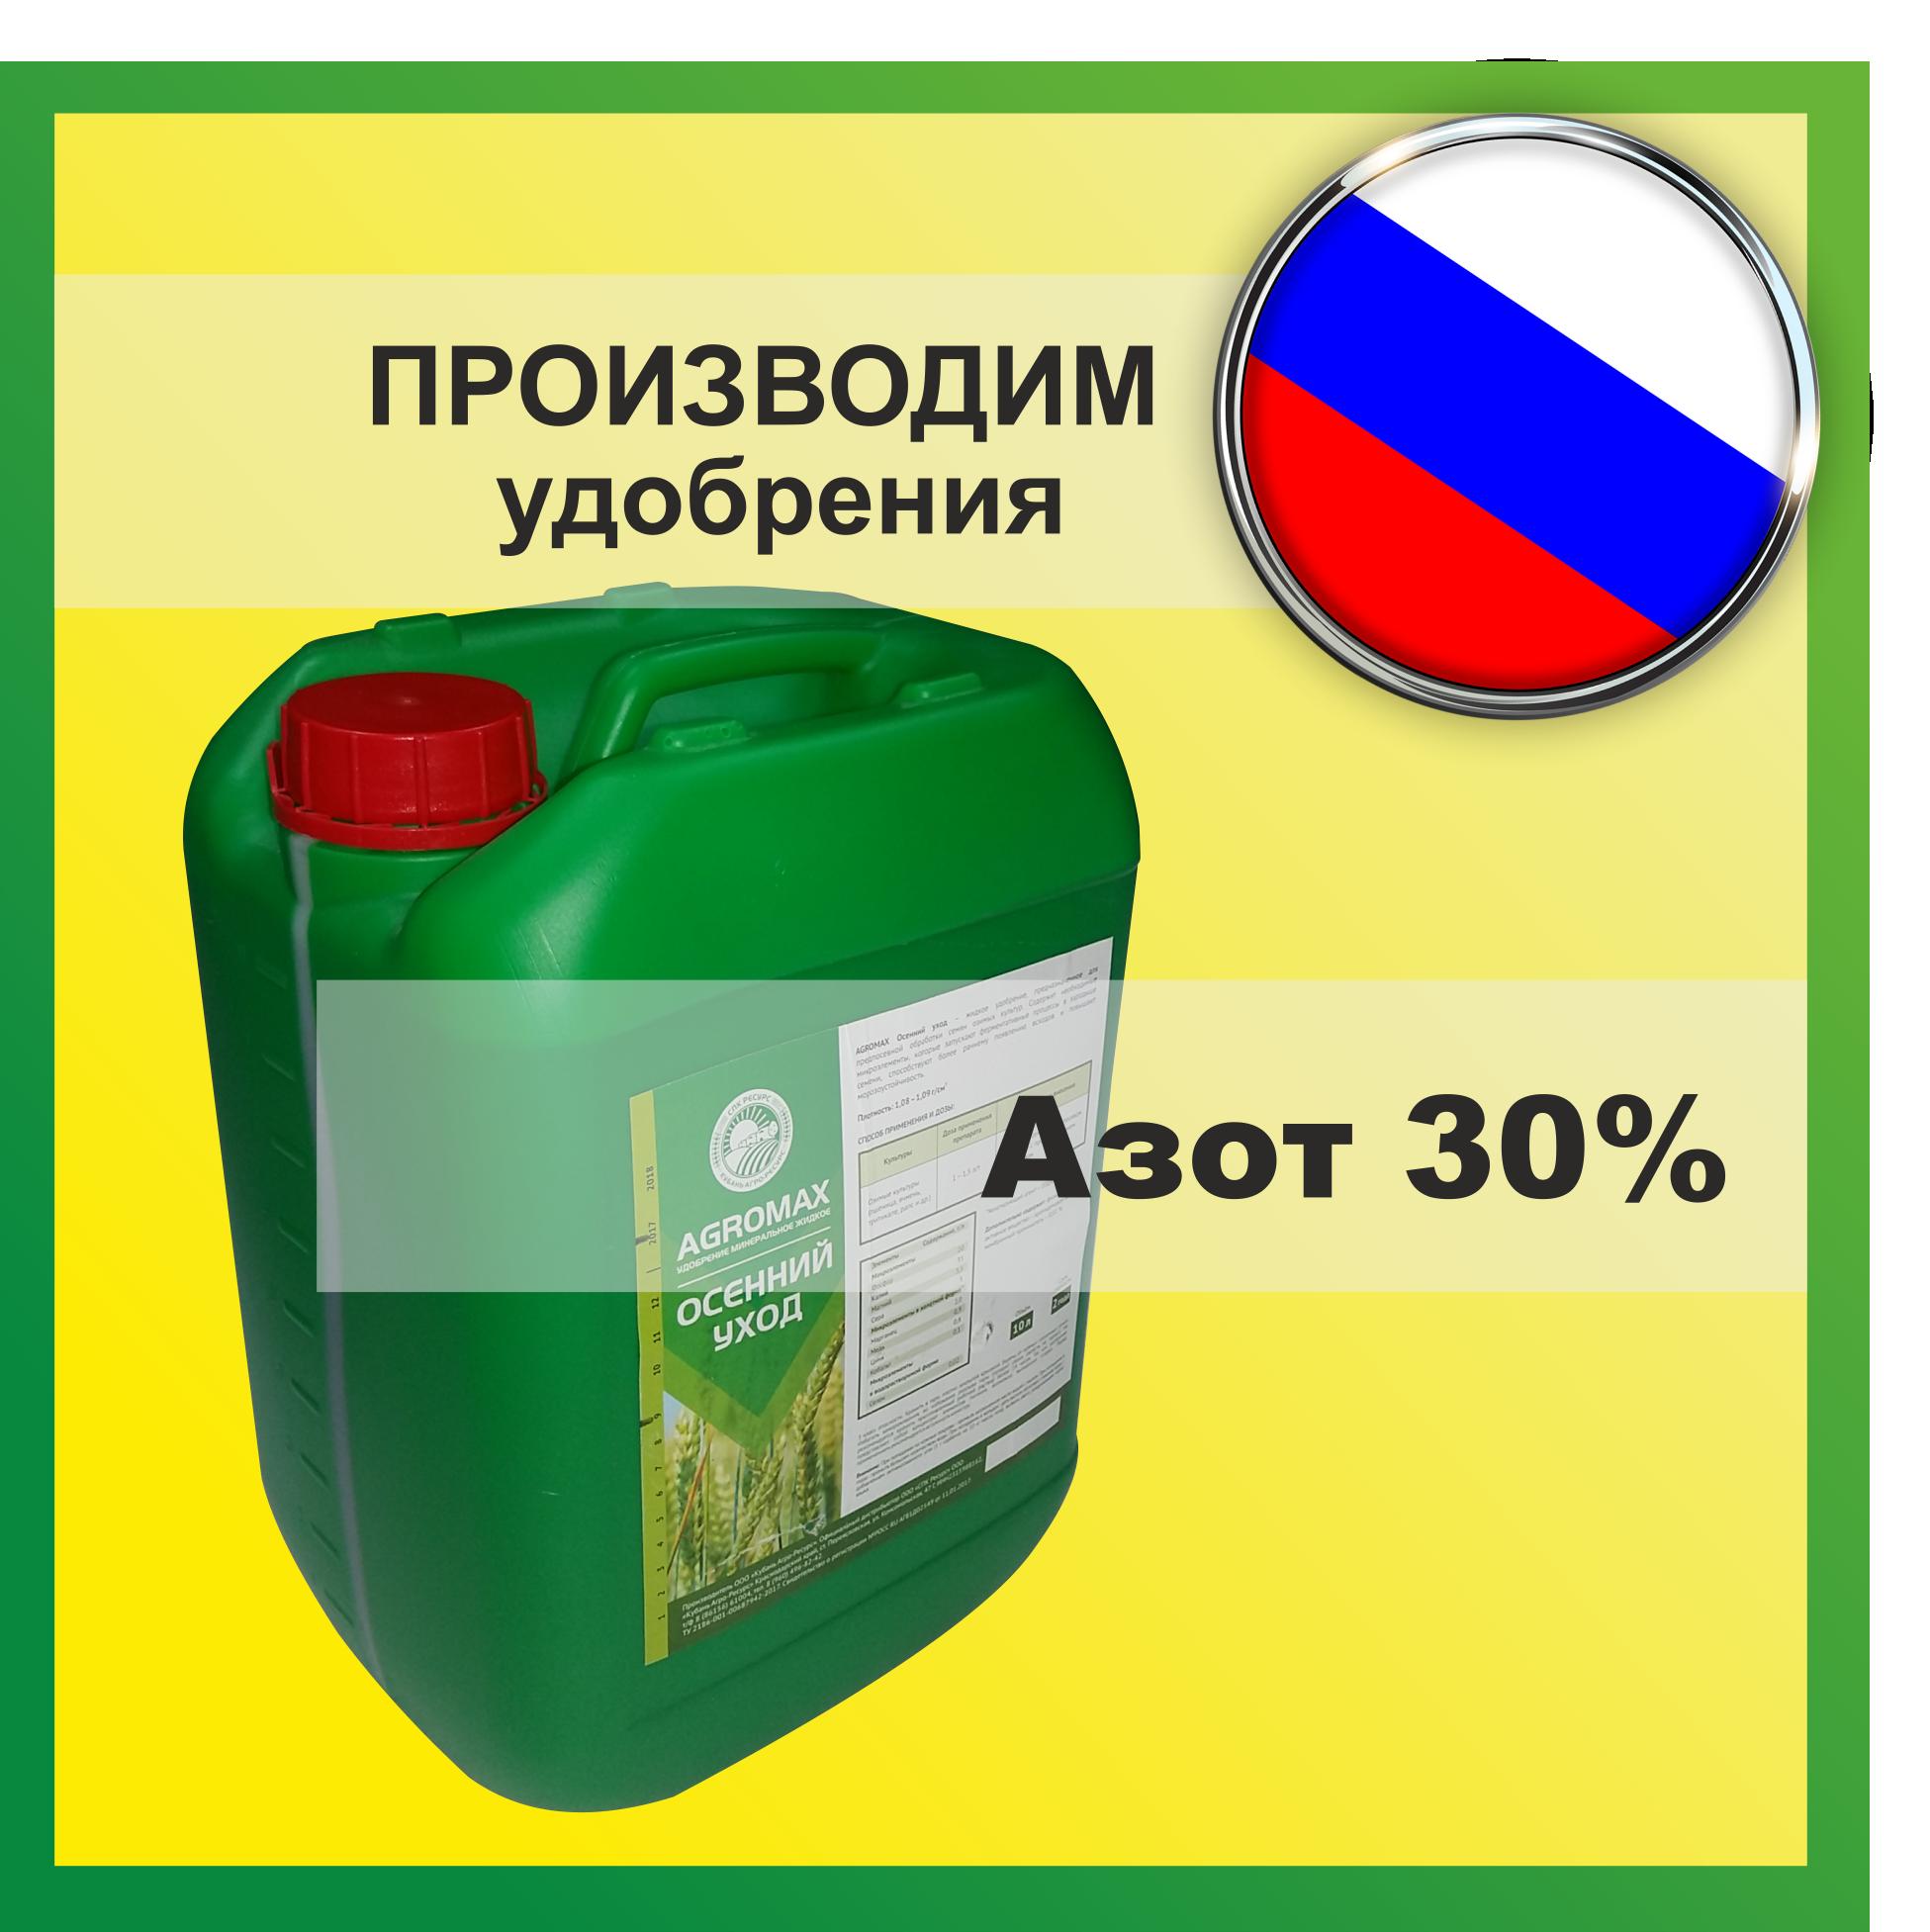 Azot-30-udobrenie-agromaks-1-1